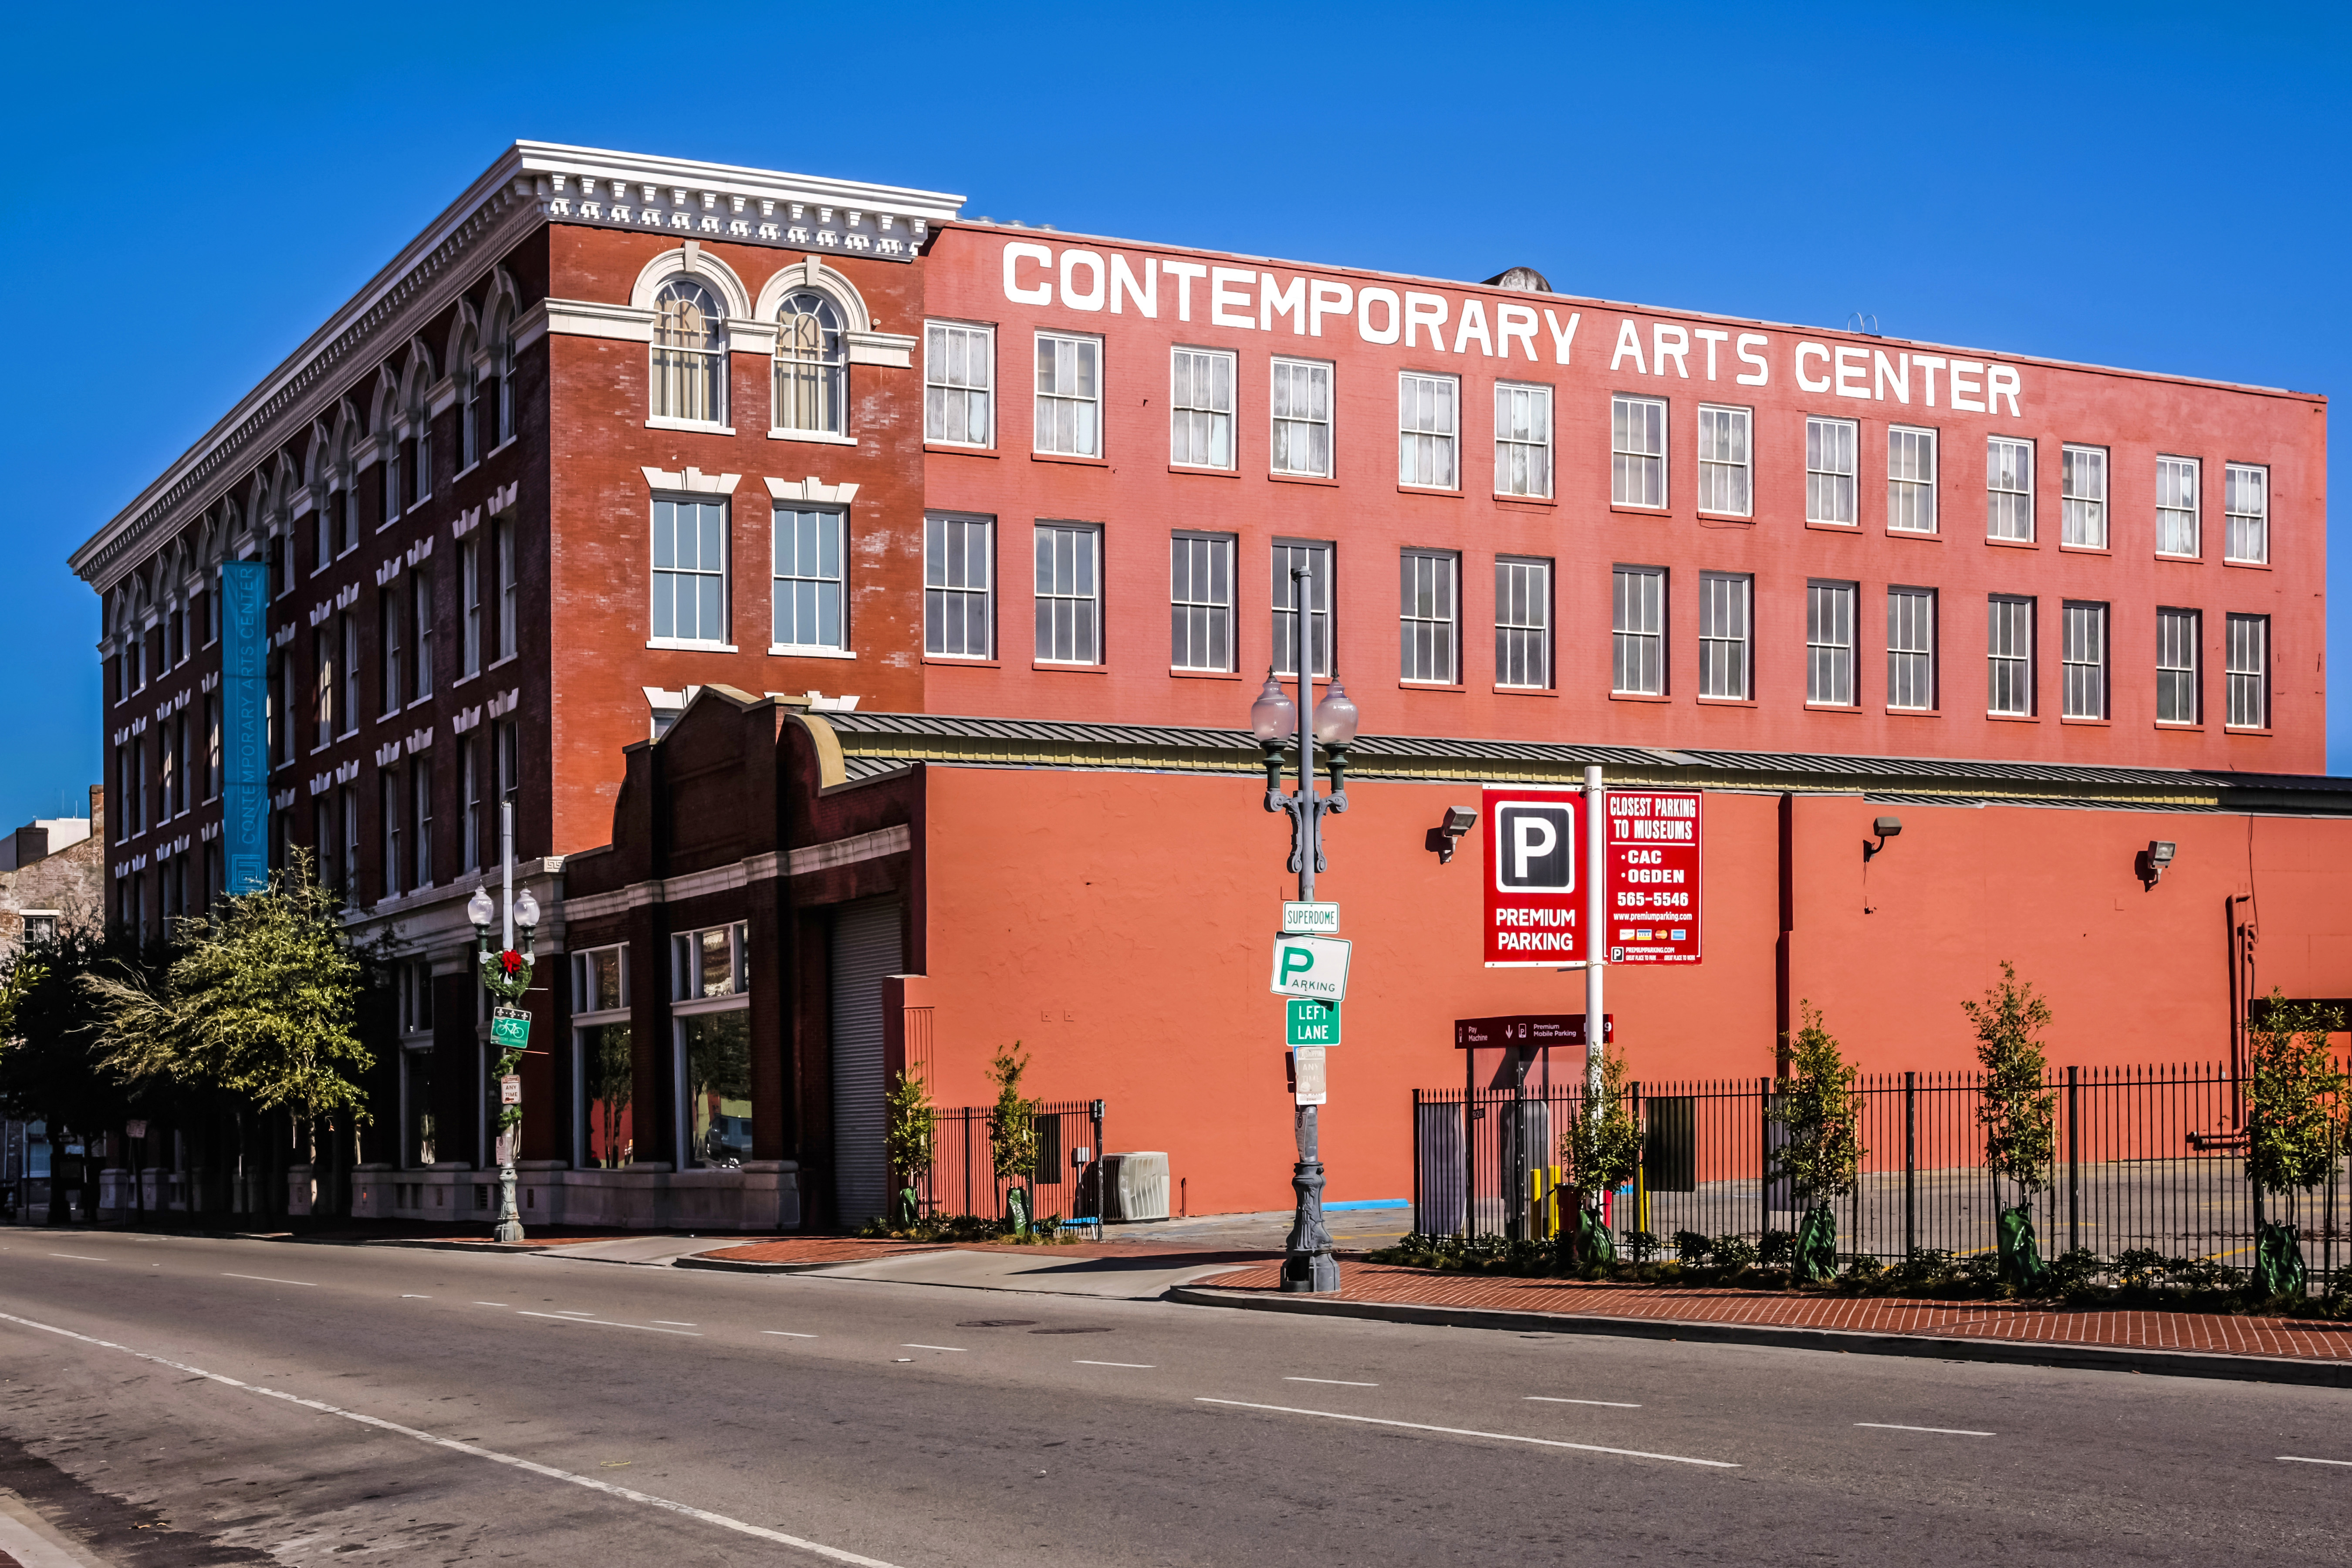 contemporary arts center new orleans exterior